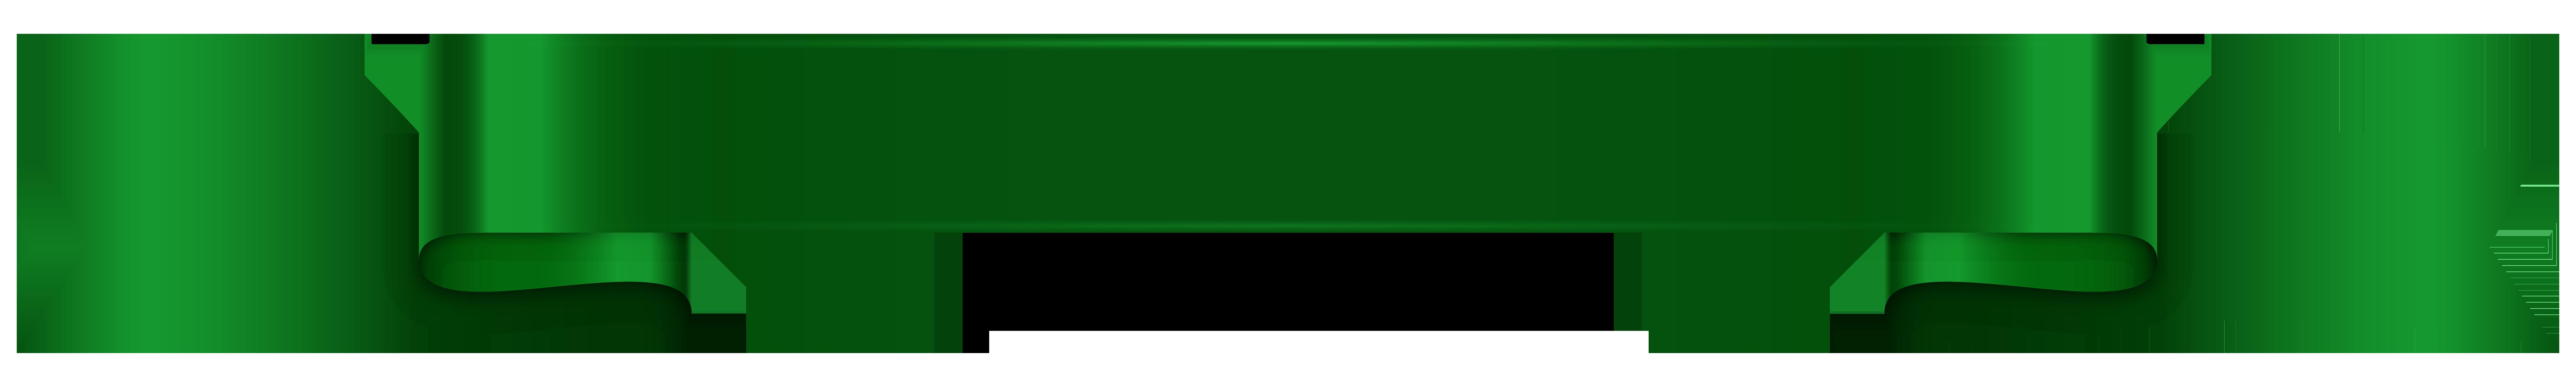 Transparent png clip art. Green clipart banner